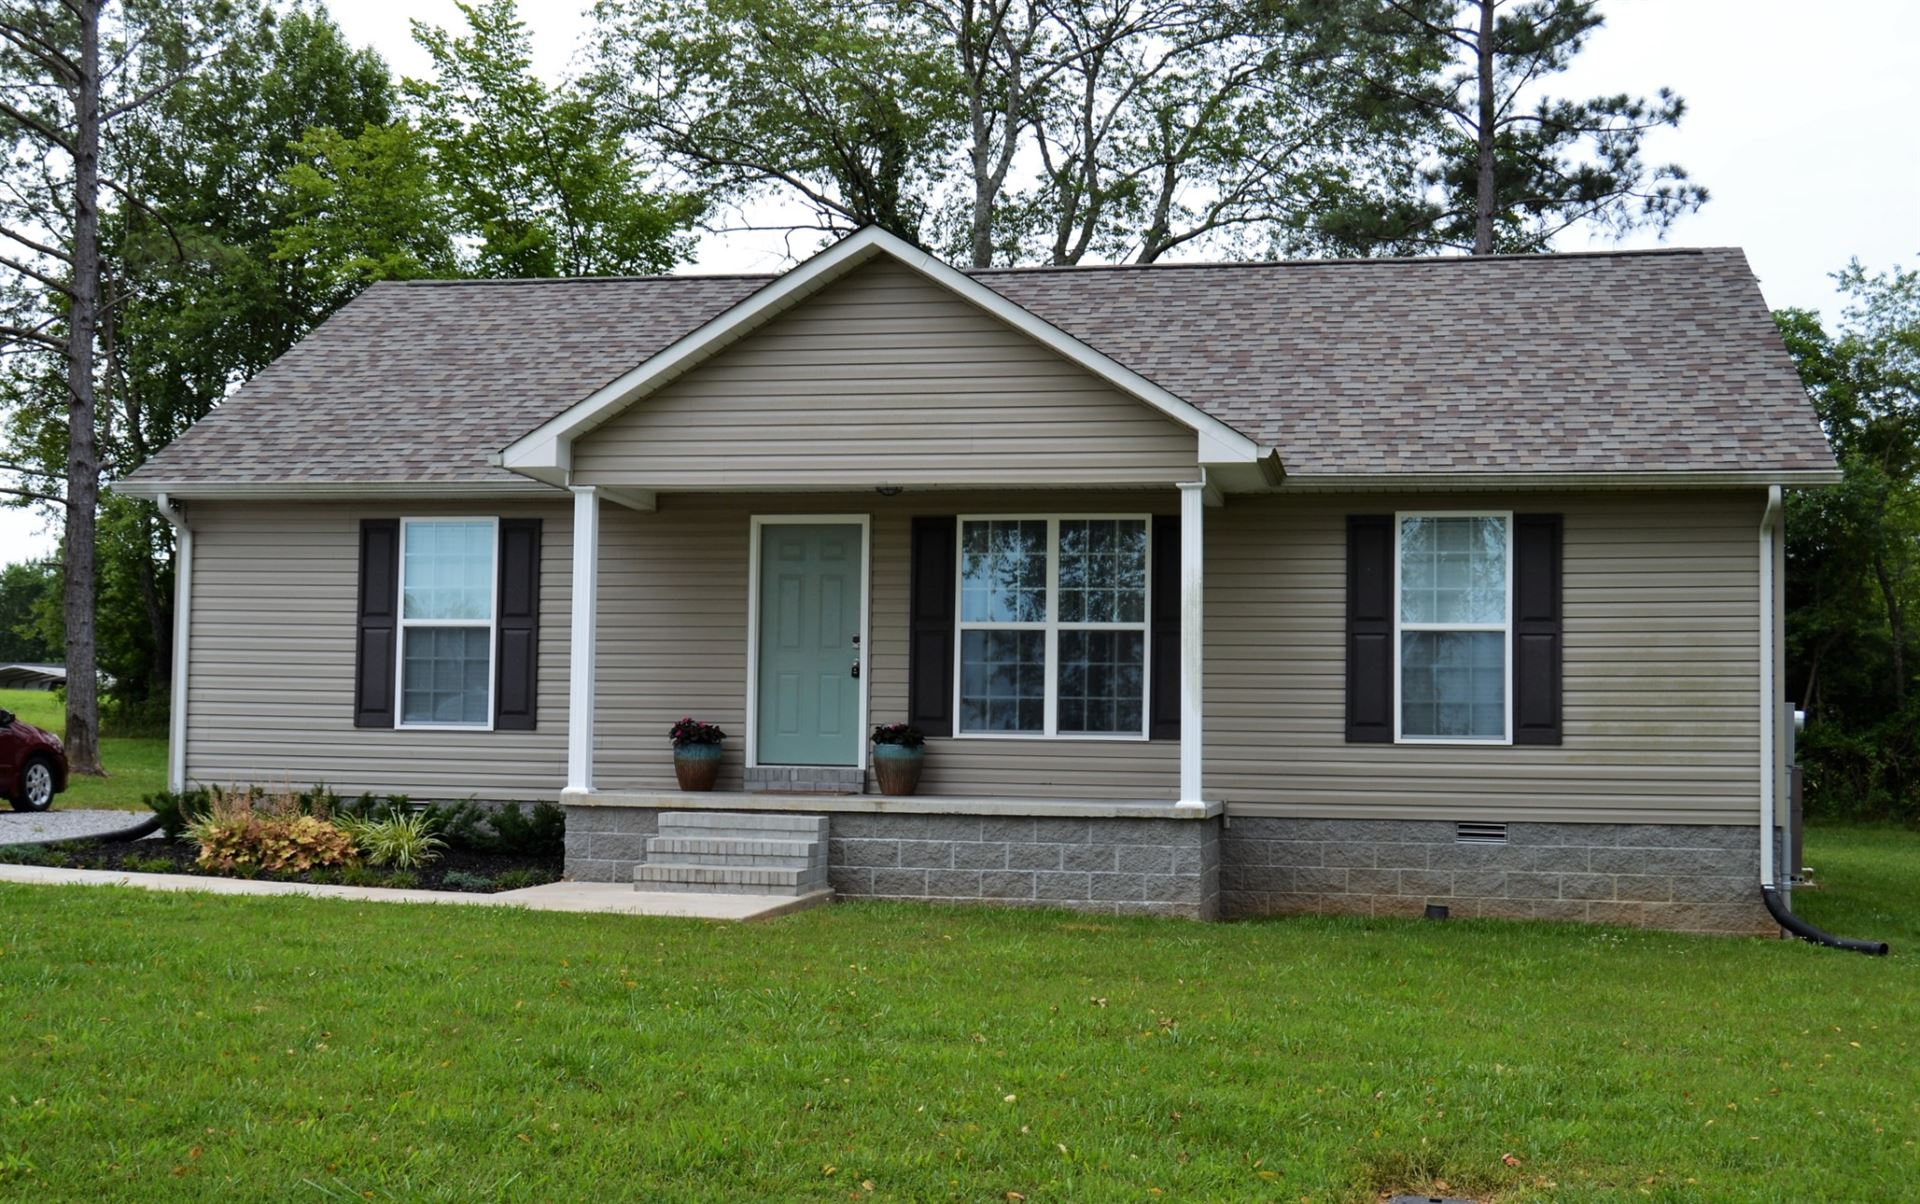 Photo of 4017 Clanton Rd, Lawrenceburg, TN 38464 (MLS # 2161180)